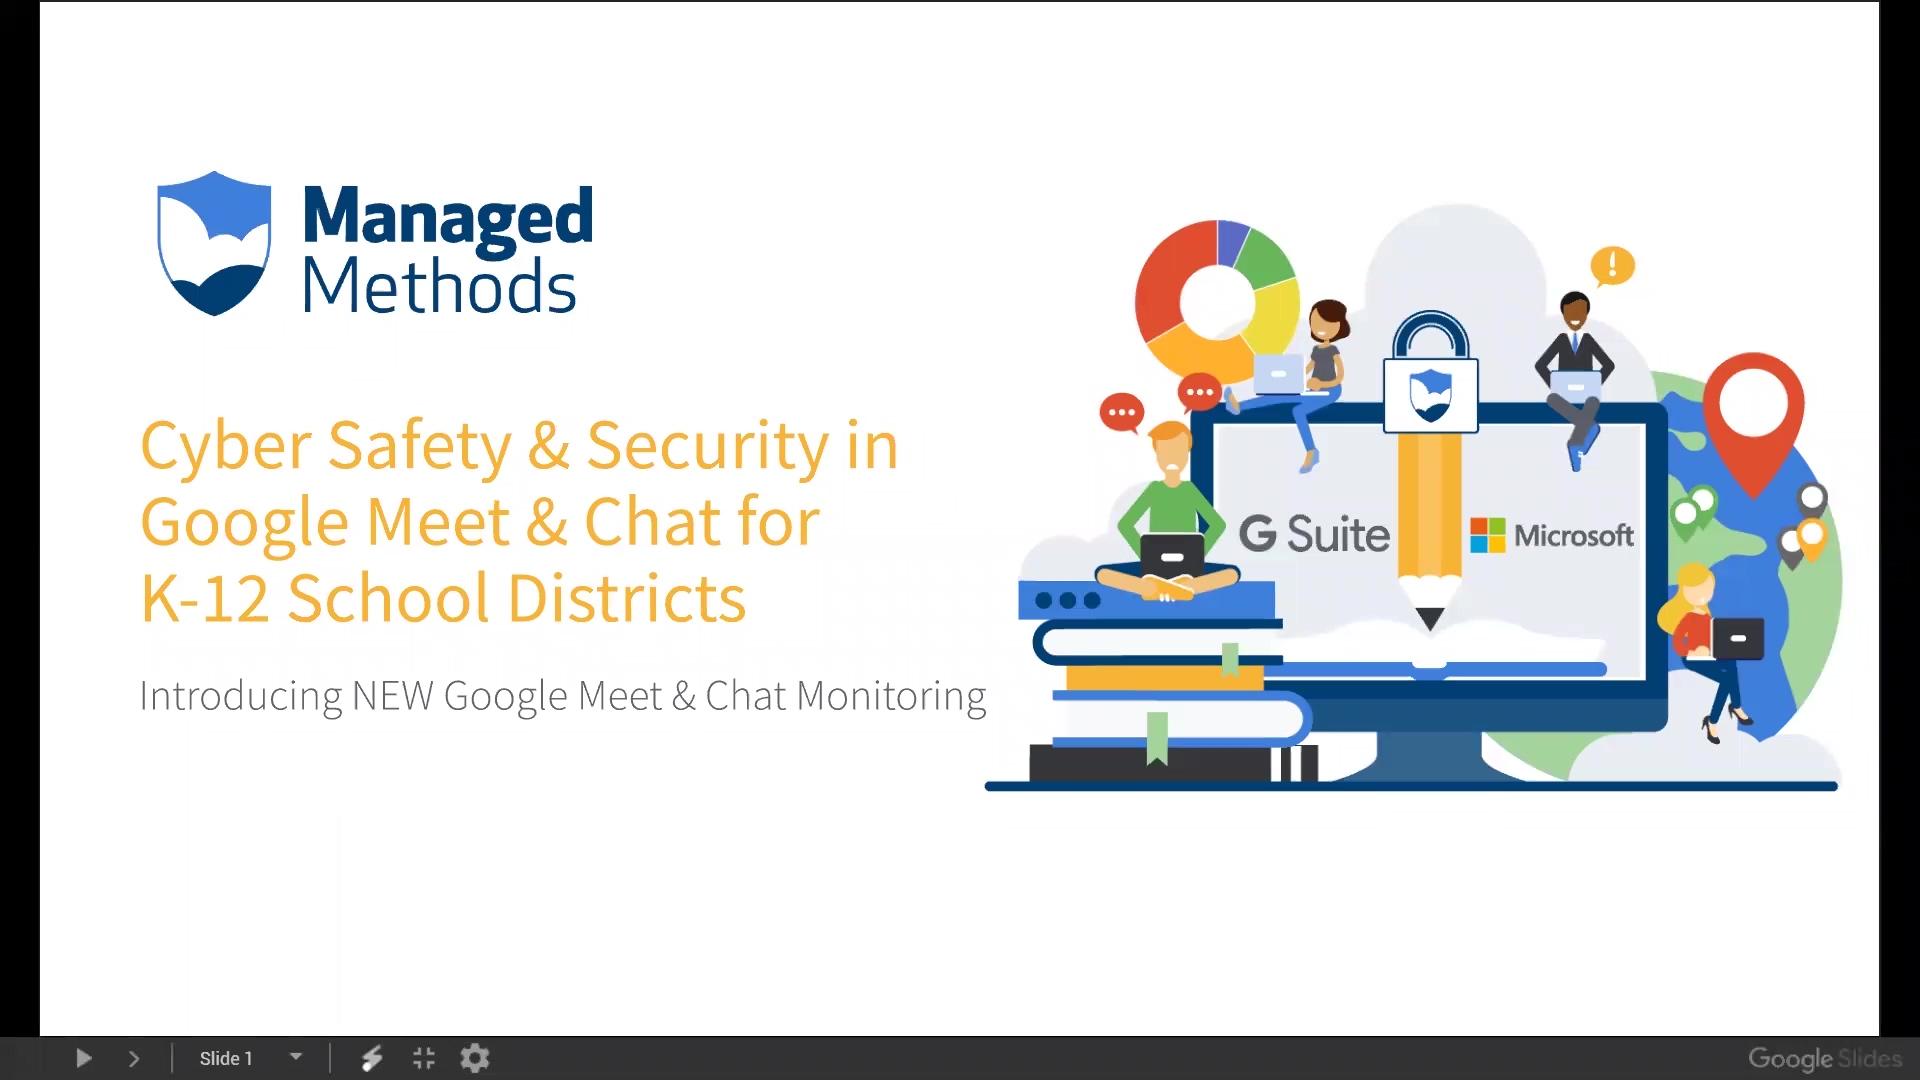 ManagedMethods Google Meet & Chat Demo Webinar Recording